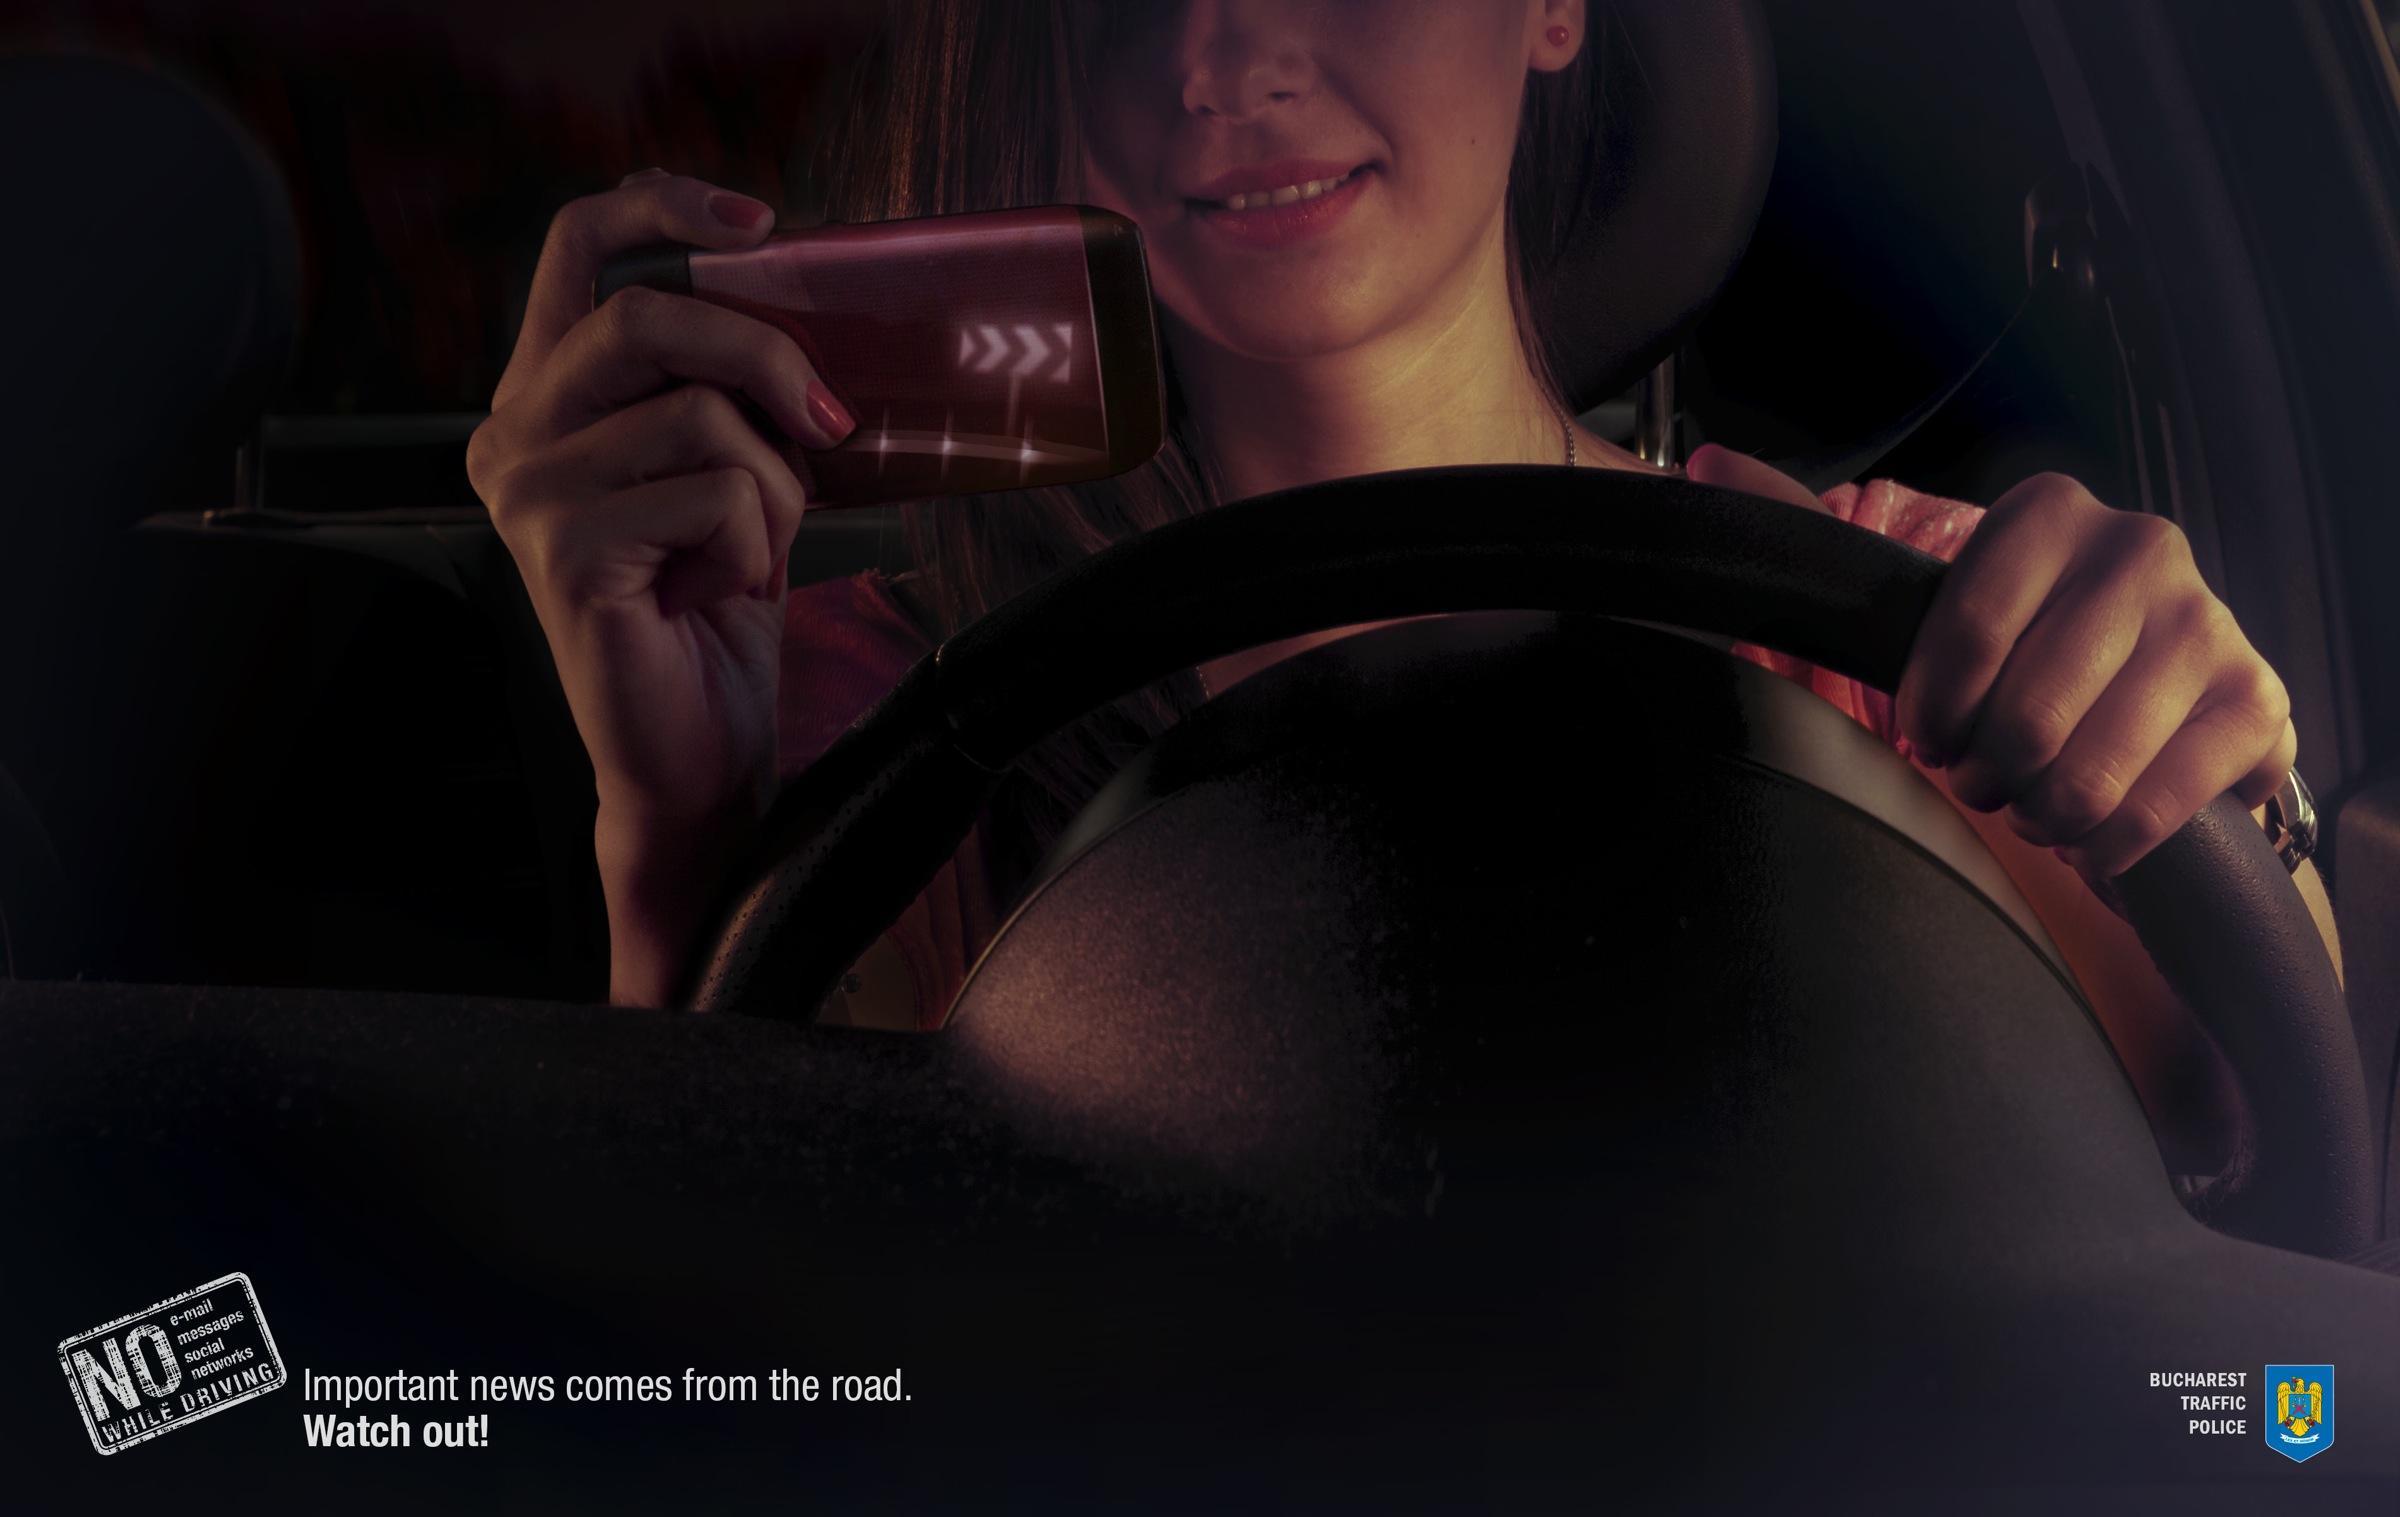 Bucharest Traffic Police Print Ad -  Dangerous bend